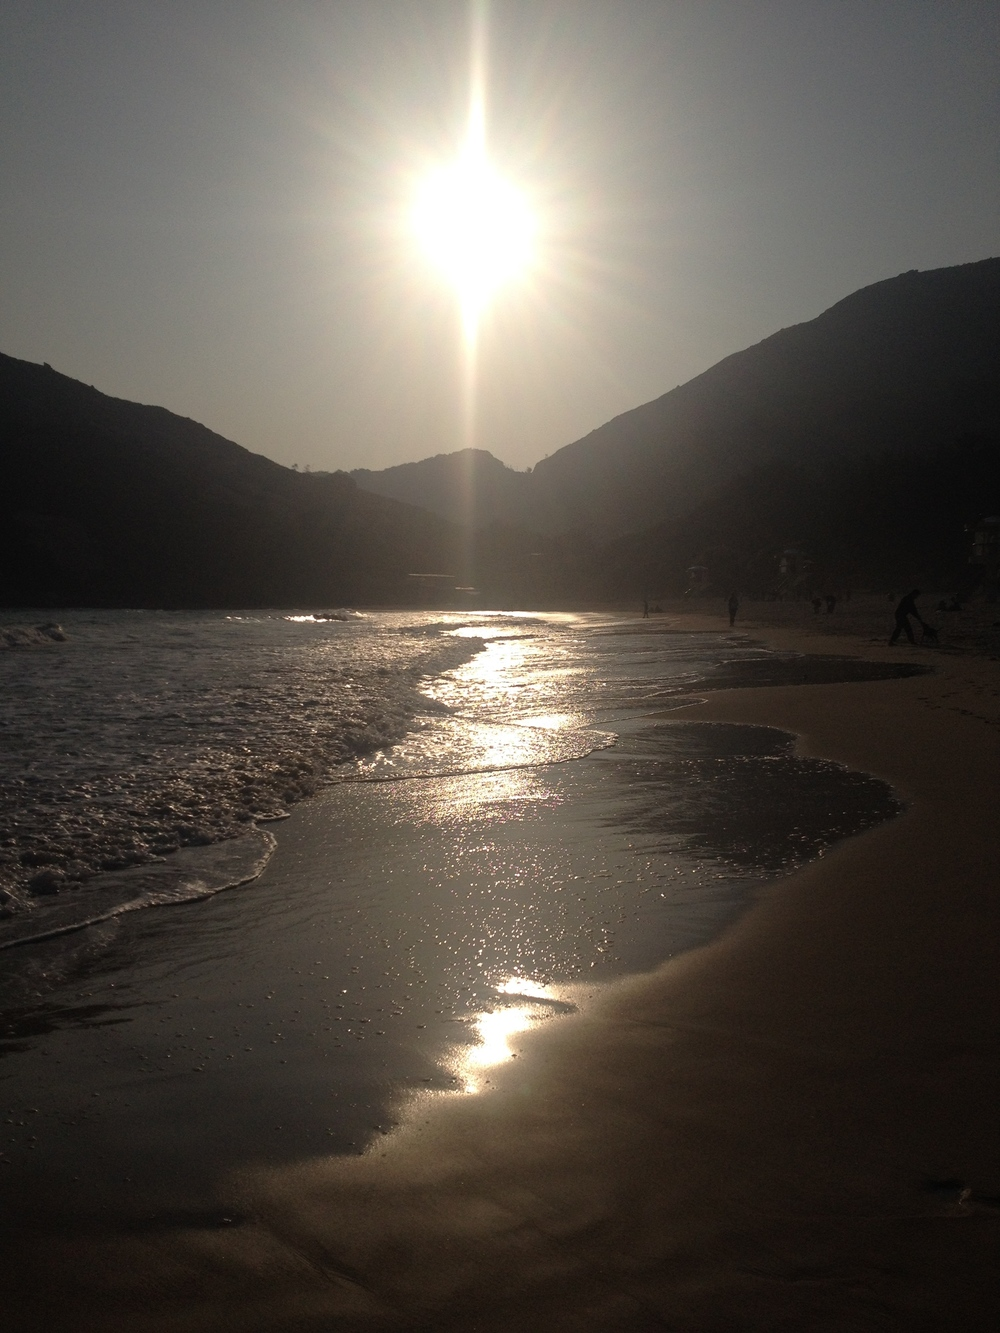 Shek O beach Hong Kong 16th January 2015